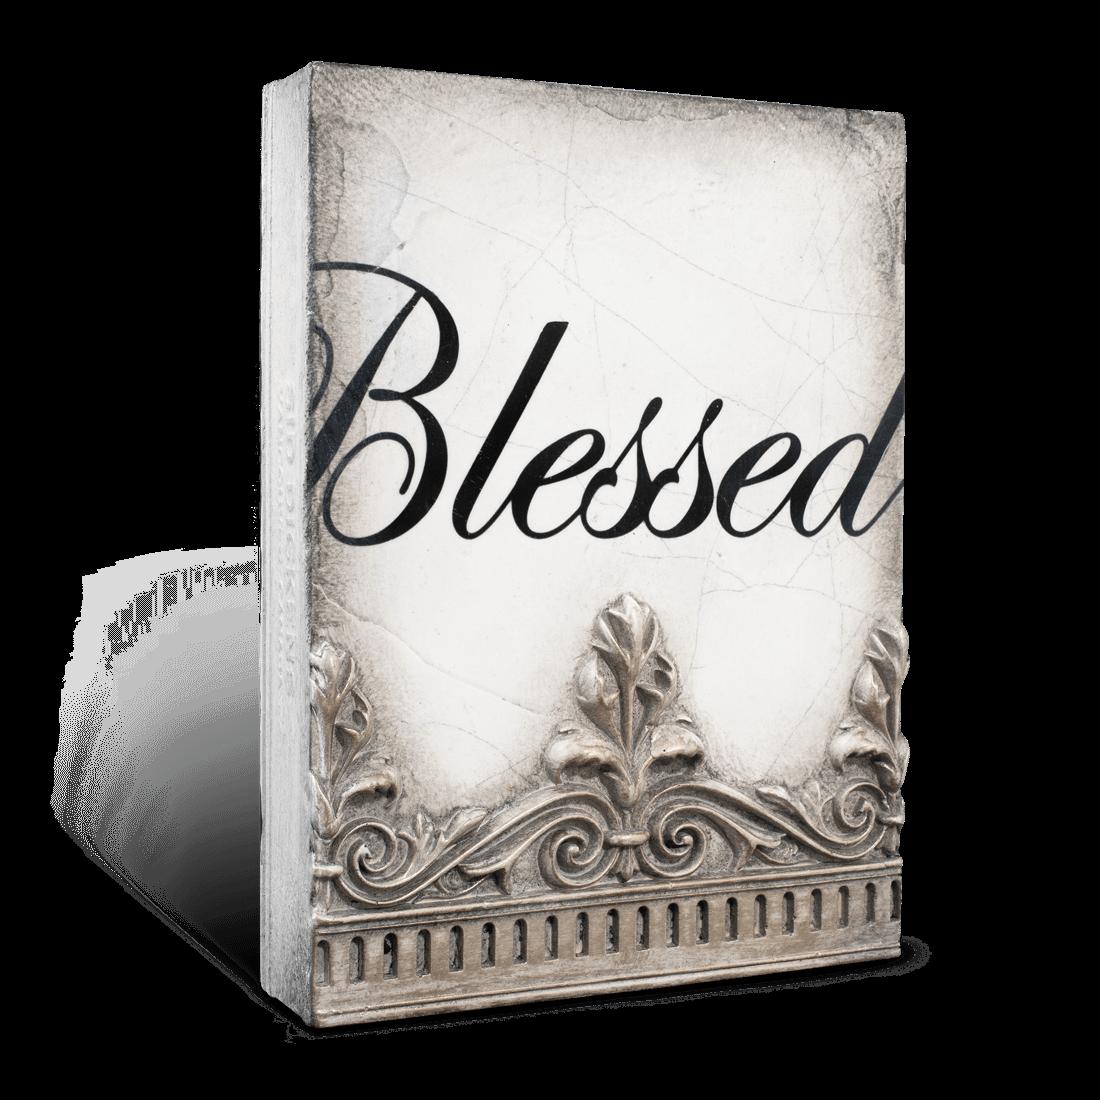 T519 - Blessed - Memory Block Sid Dickens